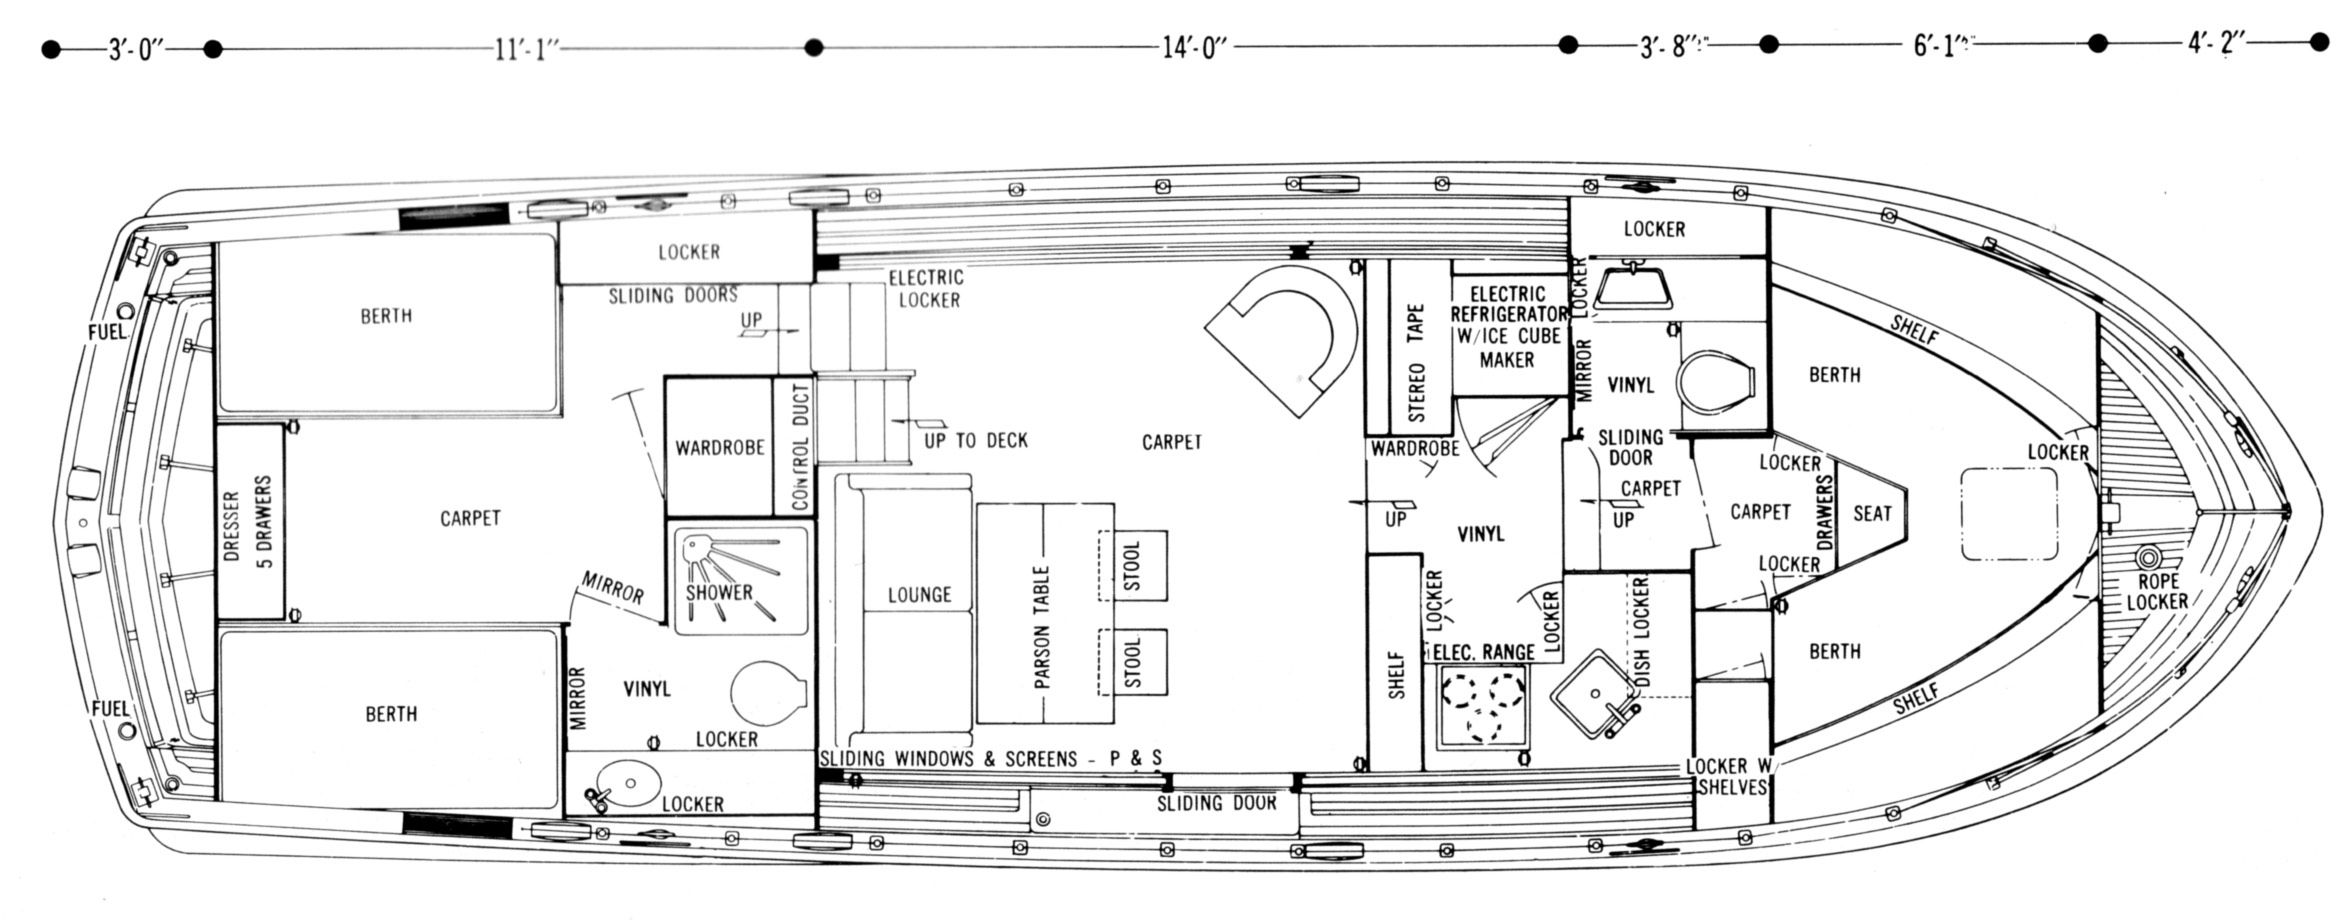 SF_9624] 1955 Chris Craft Wiring Diagram Schematic WiringPila Botse Unec Wiluq Abole Obenz Bemua Mohammedshrine Librar Wiring 101